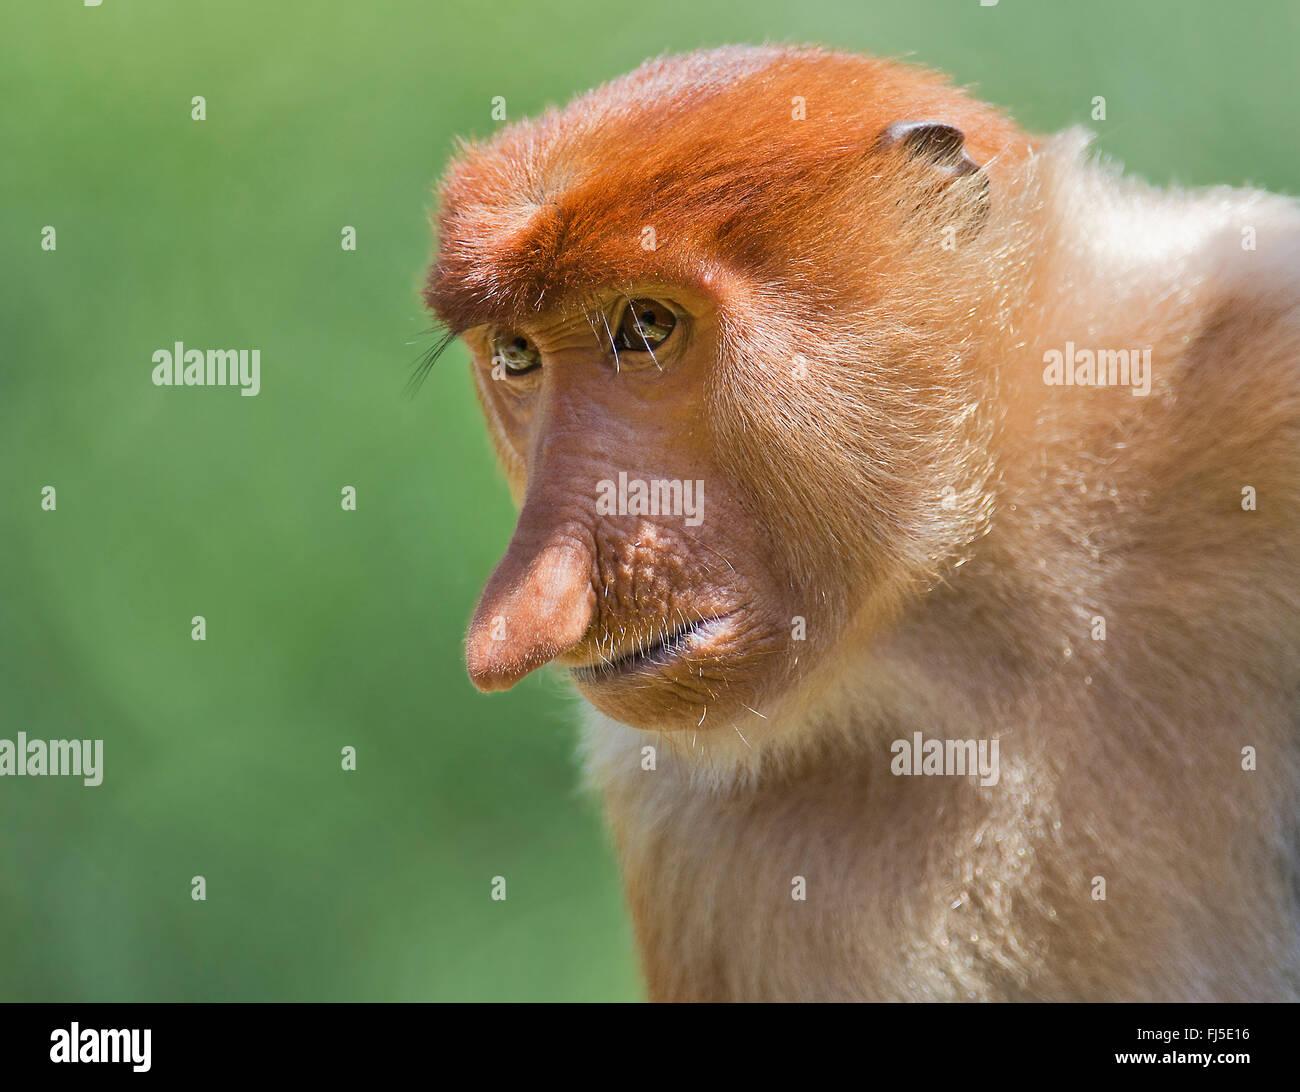 proboscis monkey (Nasalis larvatus), male, Malaysia, Borneo, Sabah - Stock Image